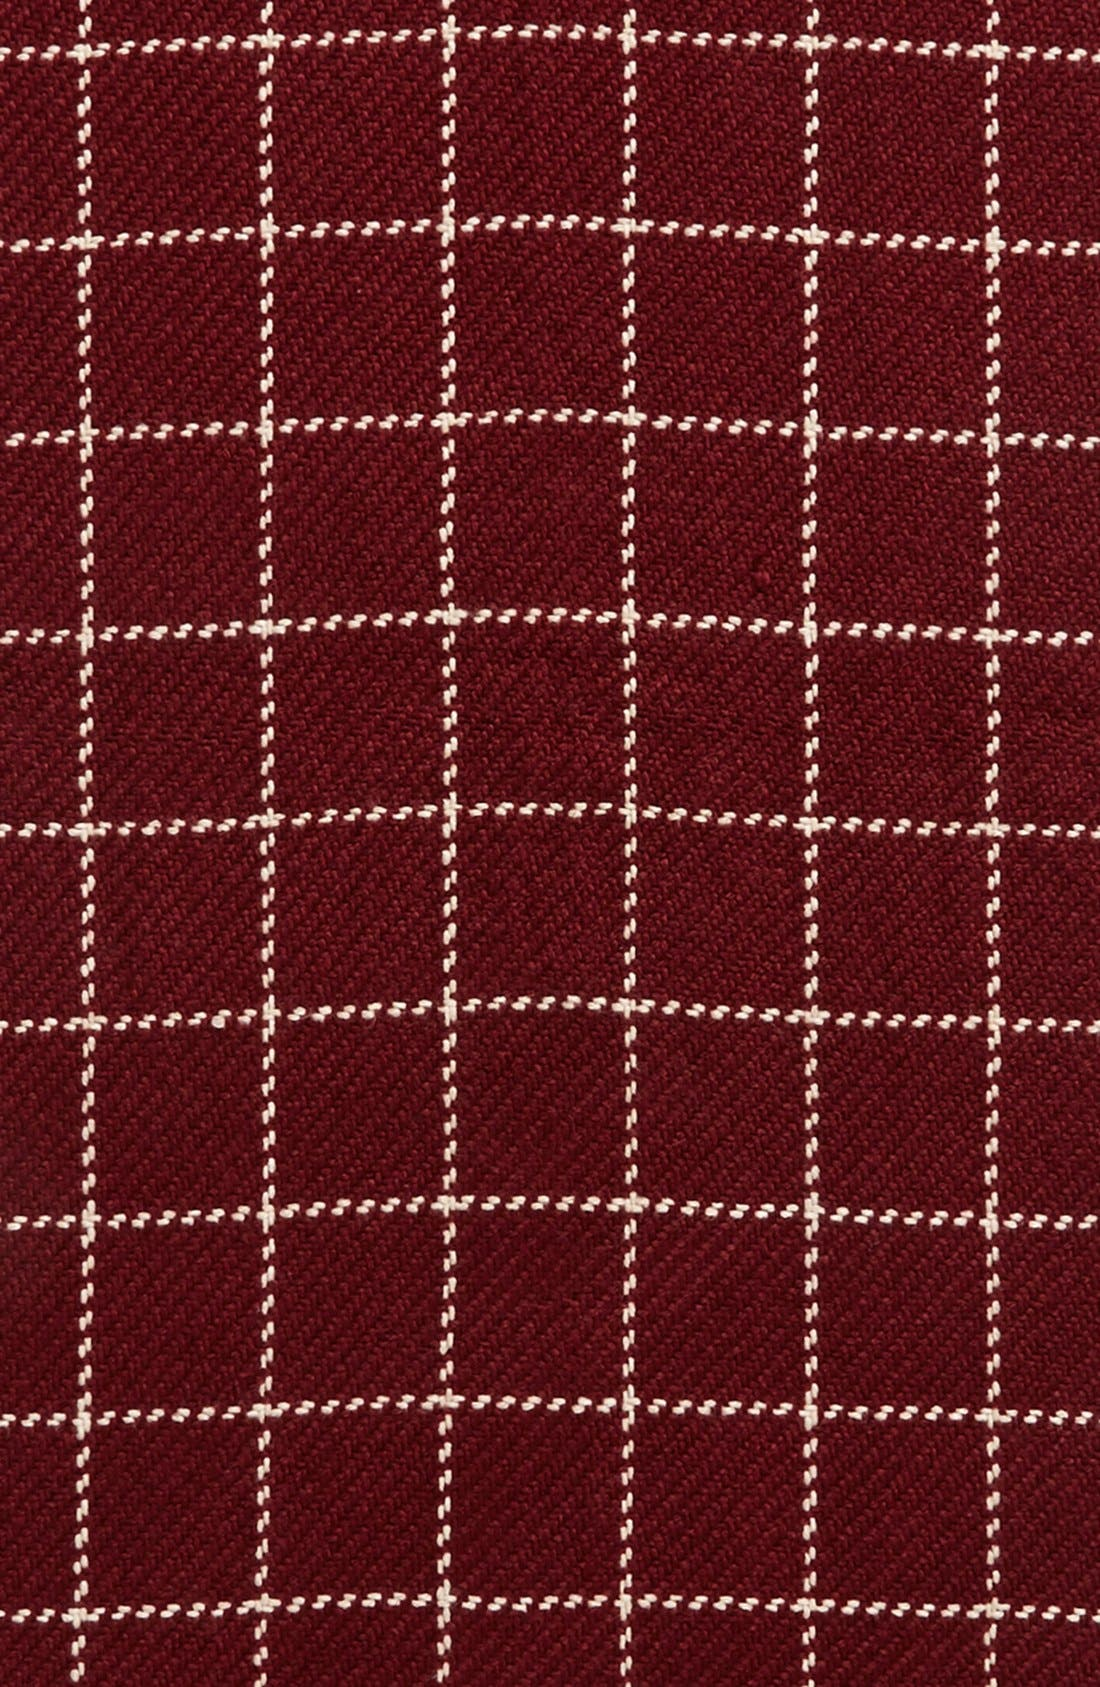 Alternate Image 3  - BP. Stitched Grid Scarf